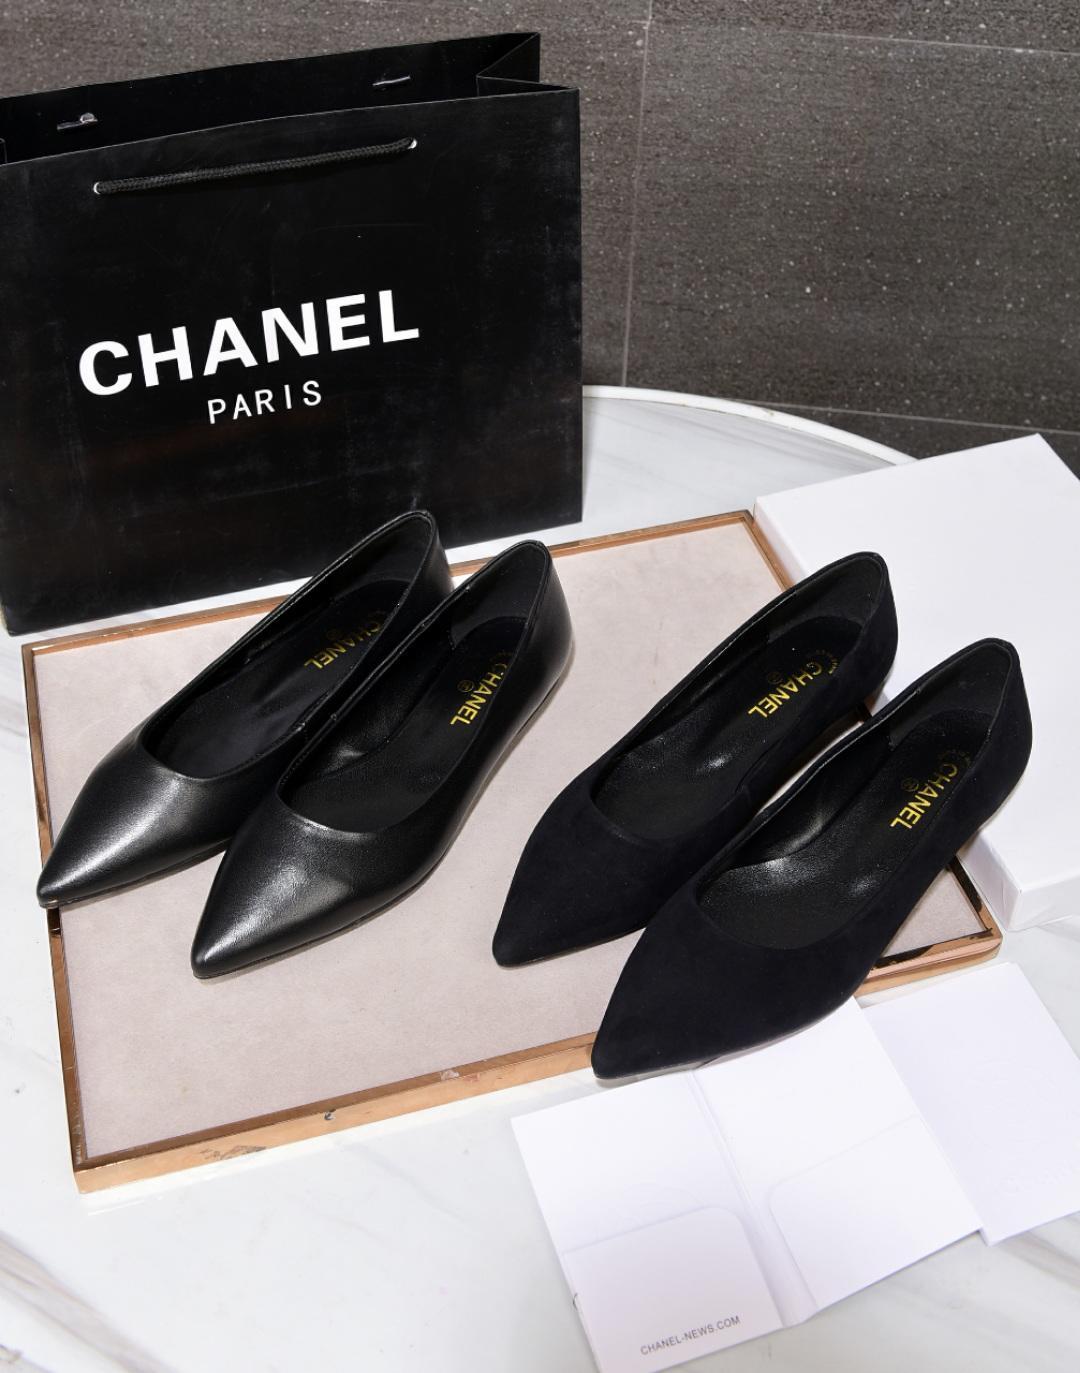 Chanel レディース 靴 専門店信頼 日本国内発送 後払い p6719066 2色